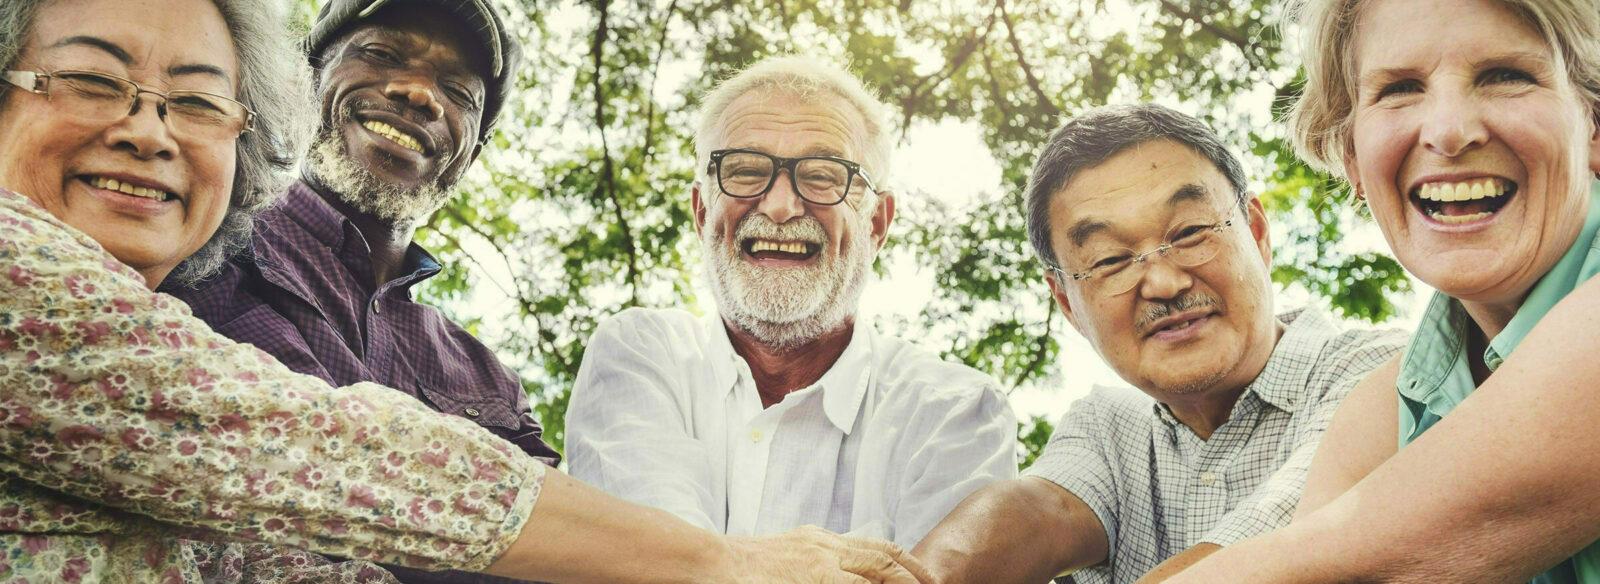 Group of Happy Smiling Seniors